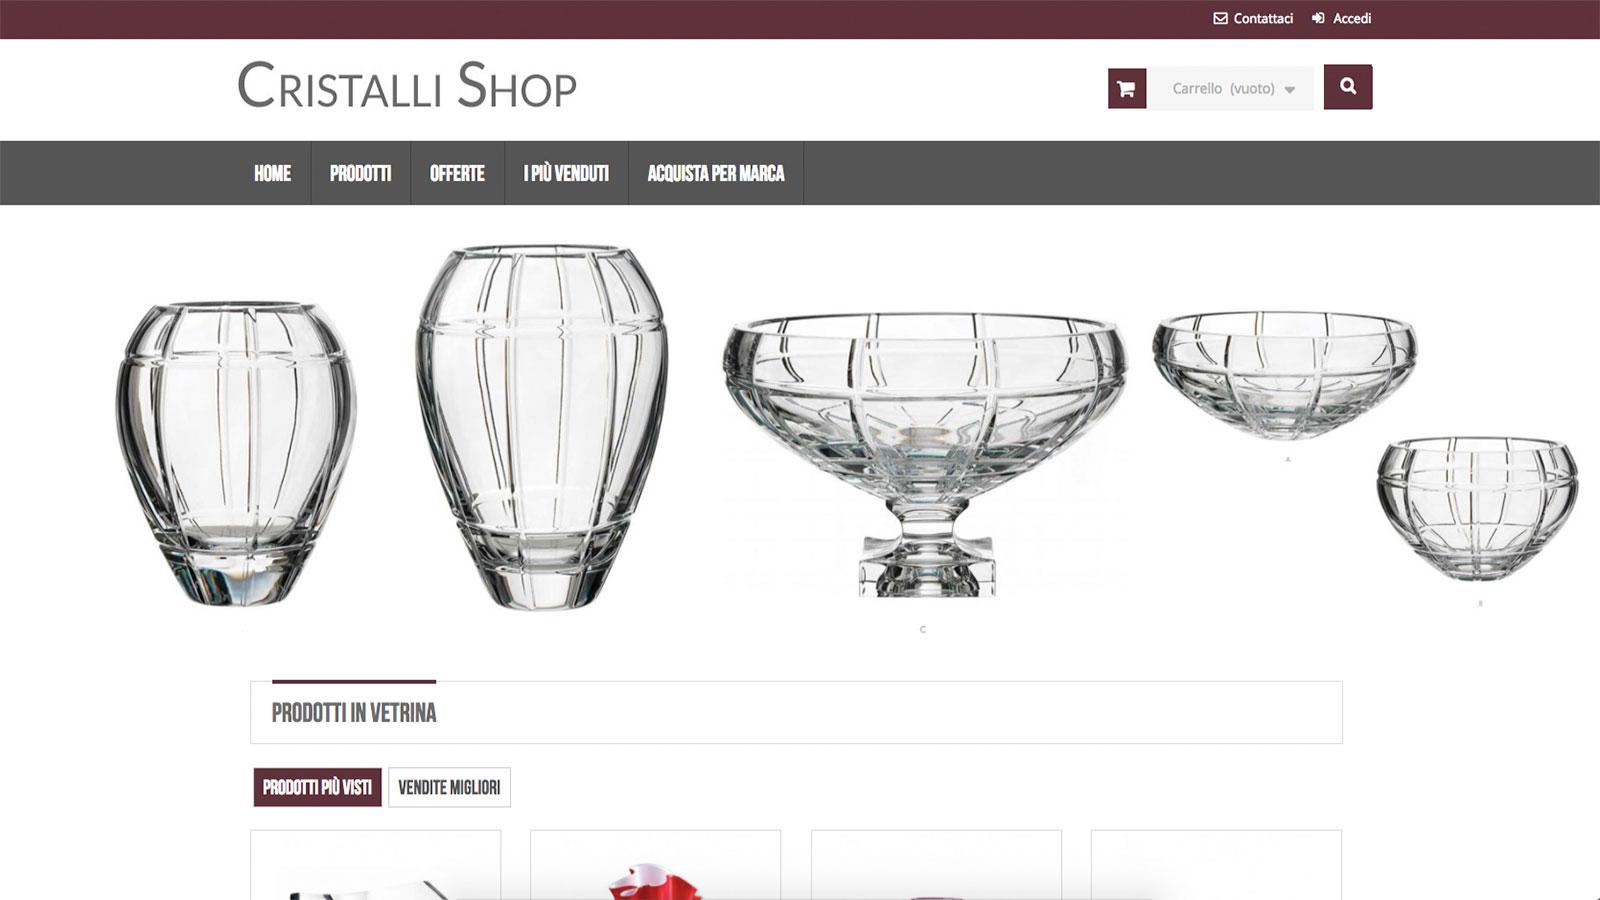 Cristalli Shop